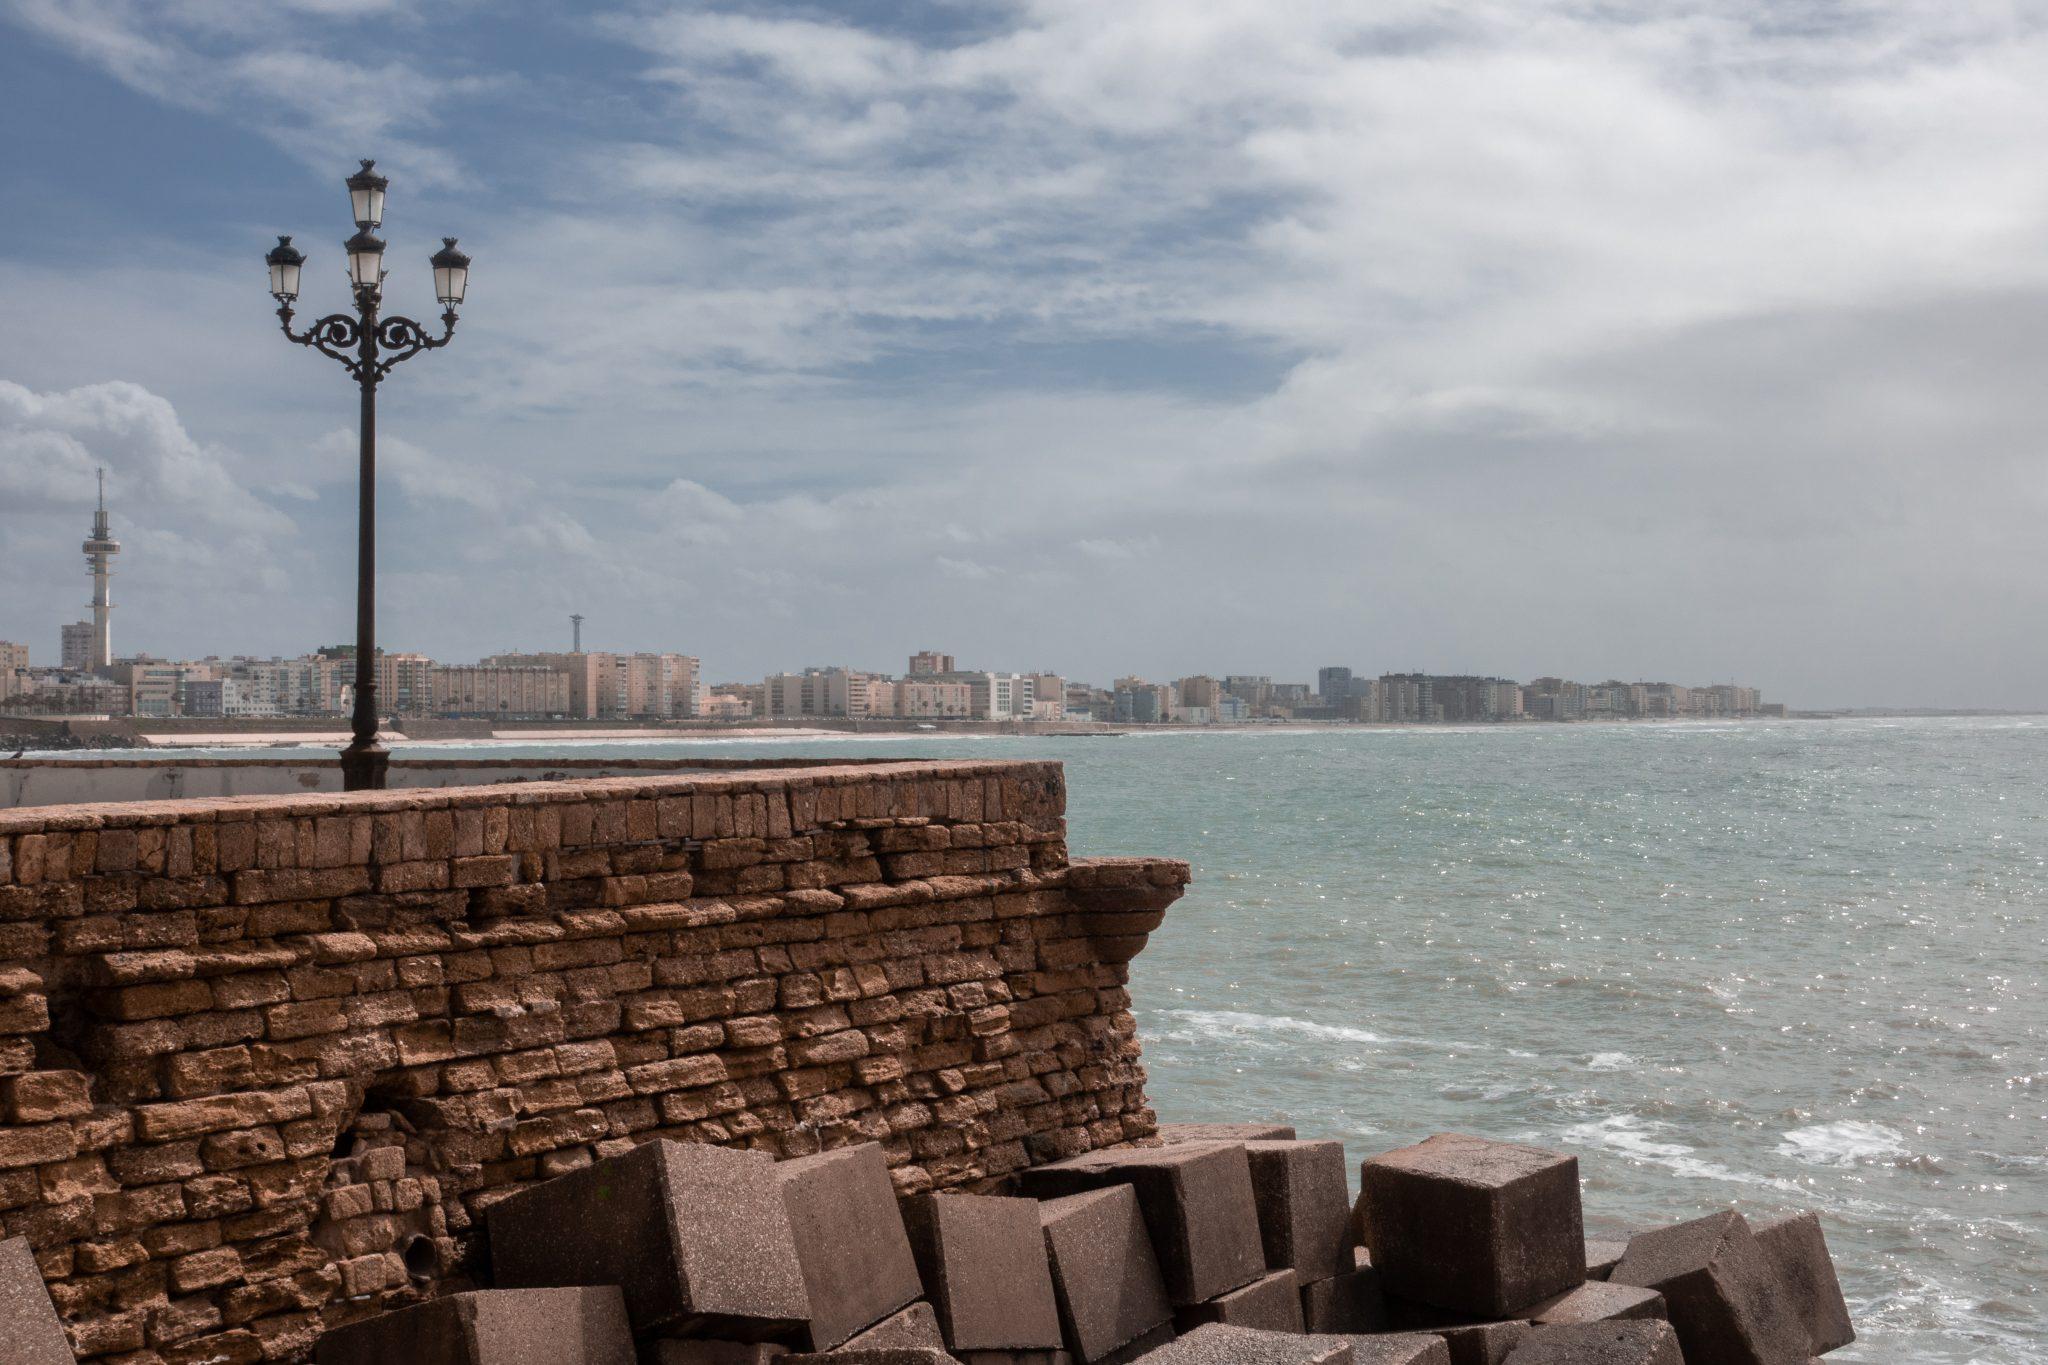 7-kleine-geheimtipps-cádiz-promenade-meer